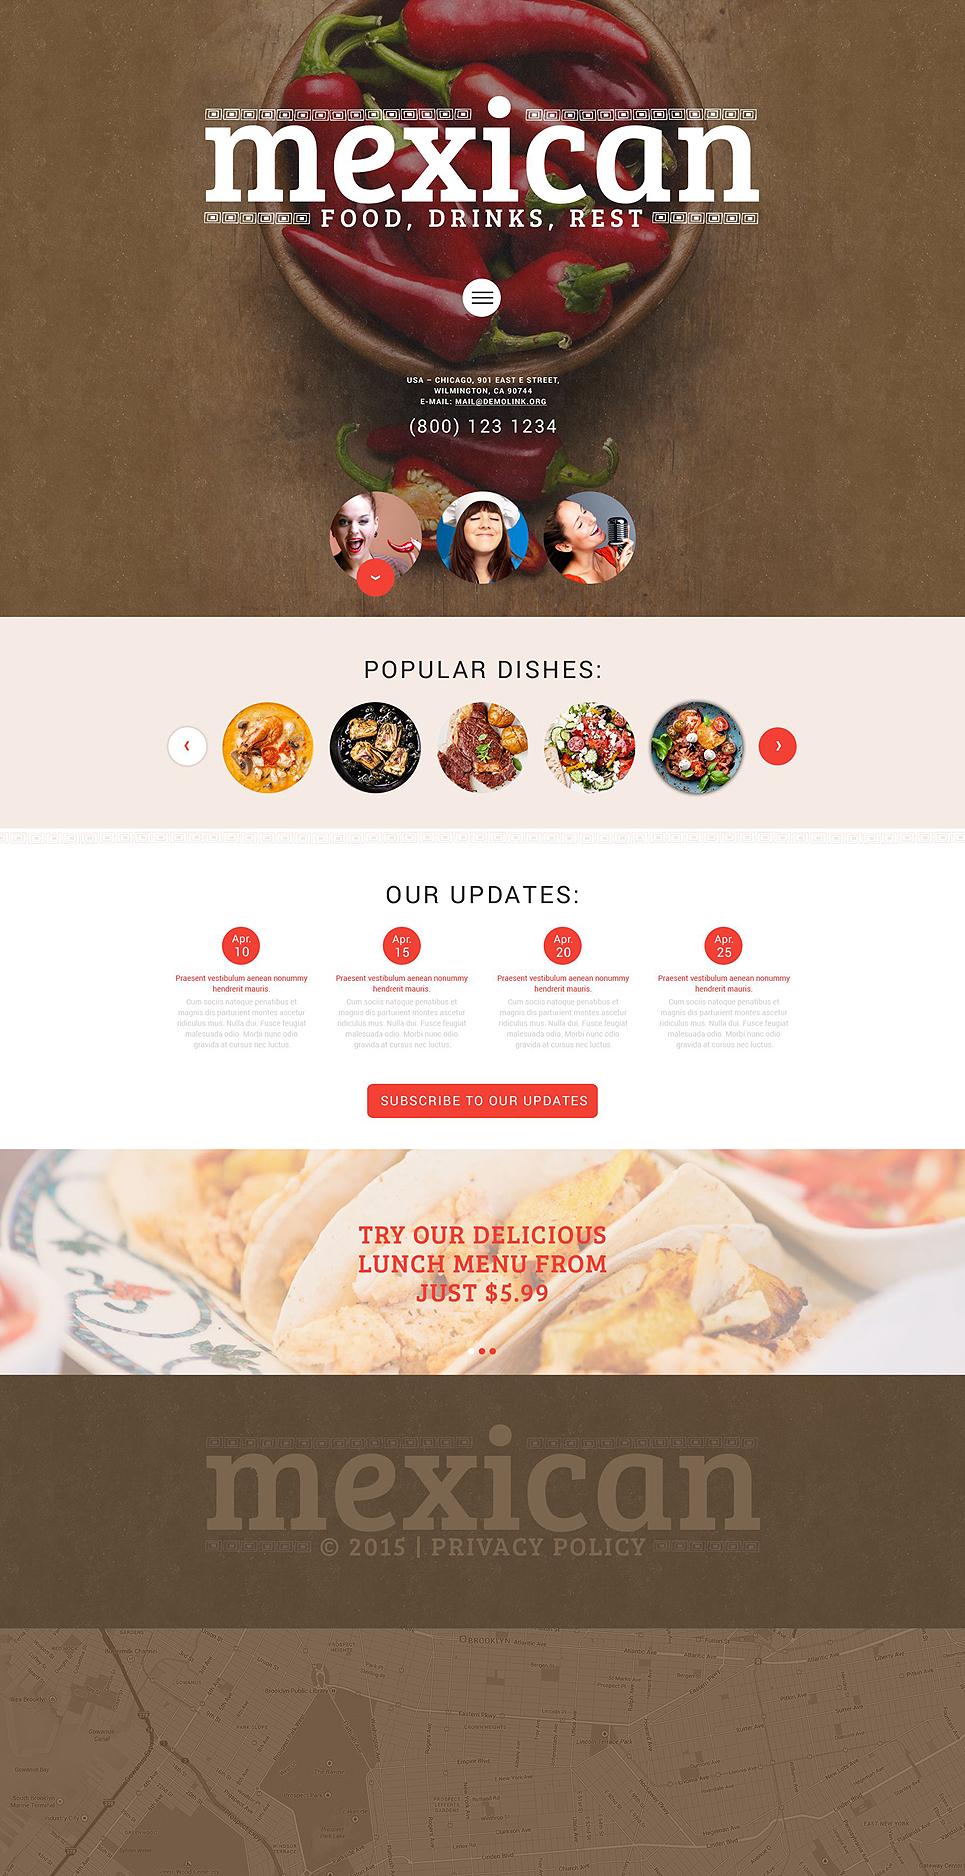 Mexican restaurant - Perfect WordPress Theme for Restaurant Business Websites